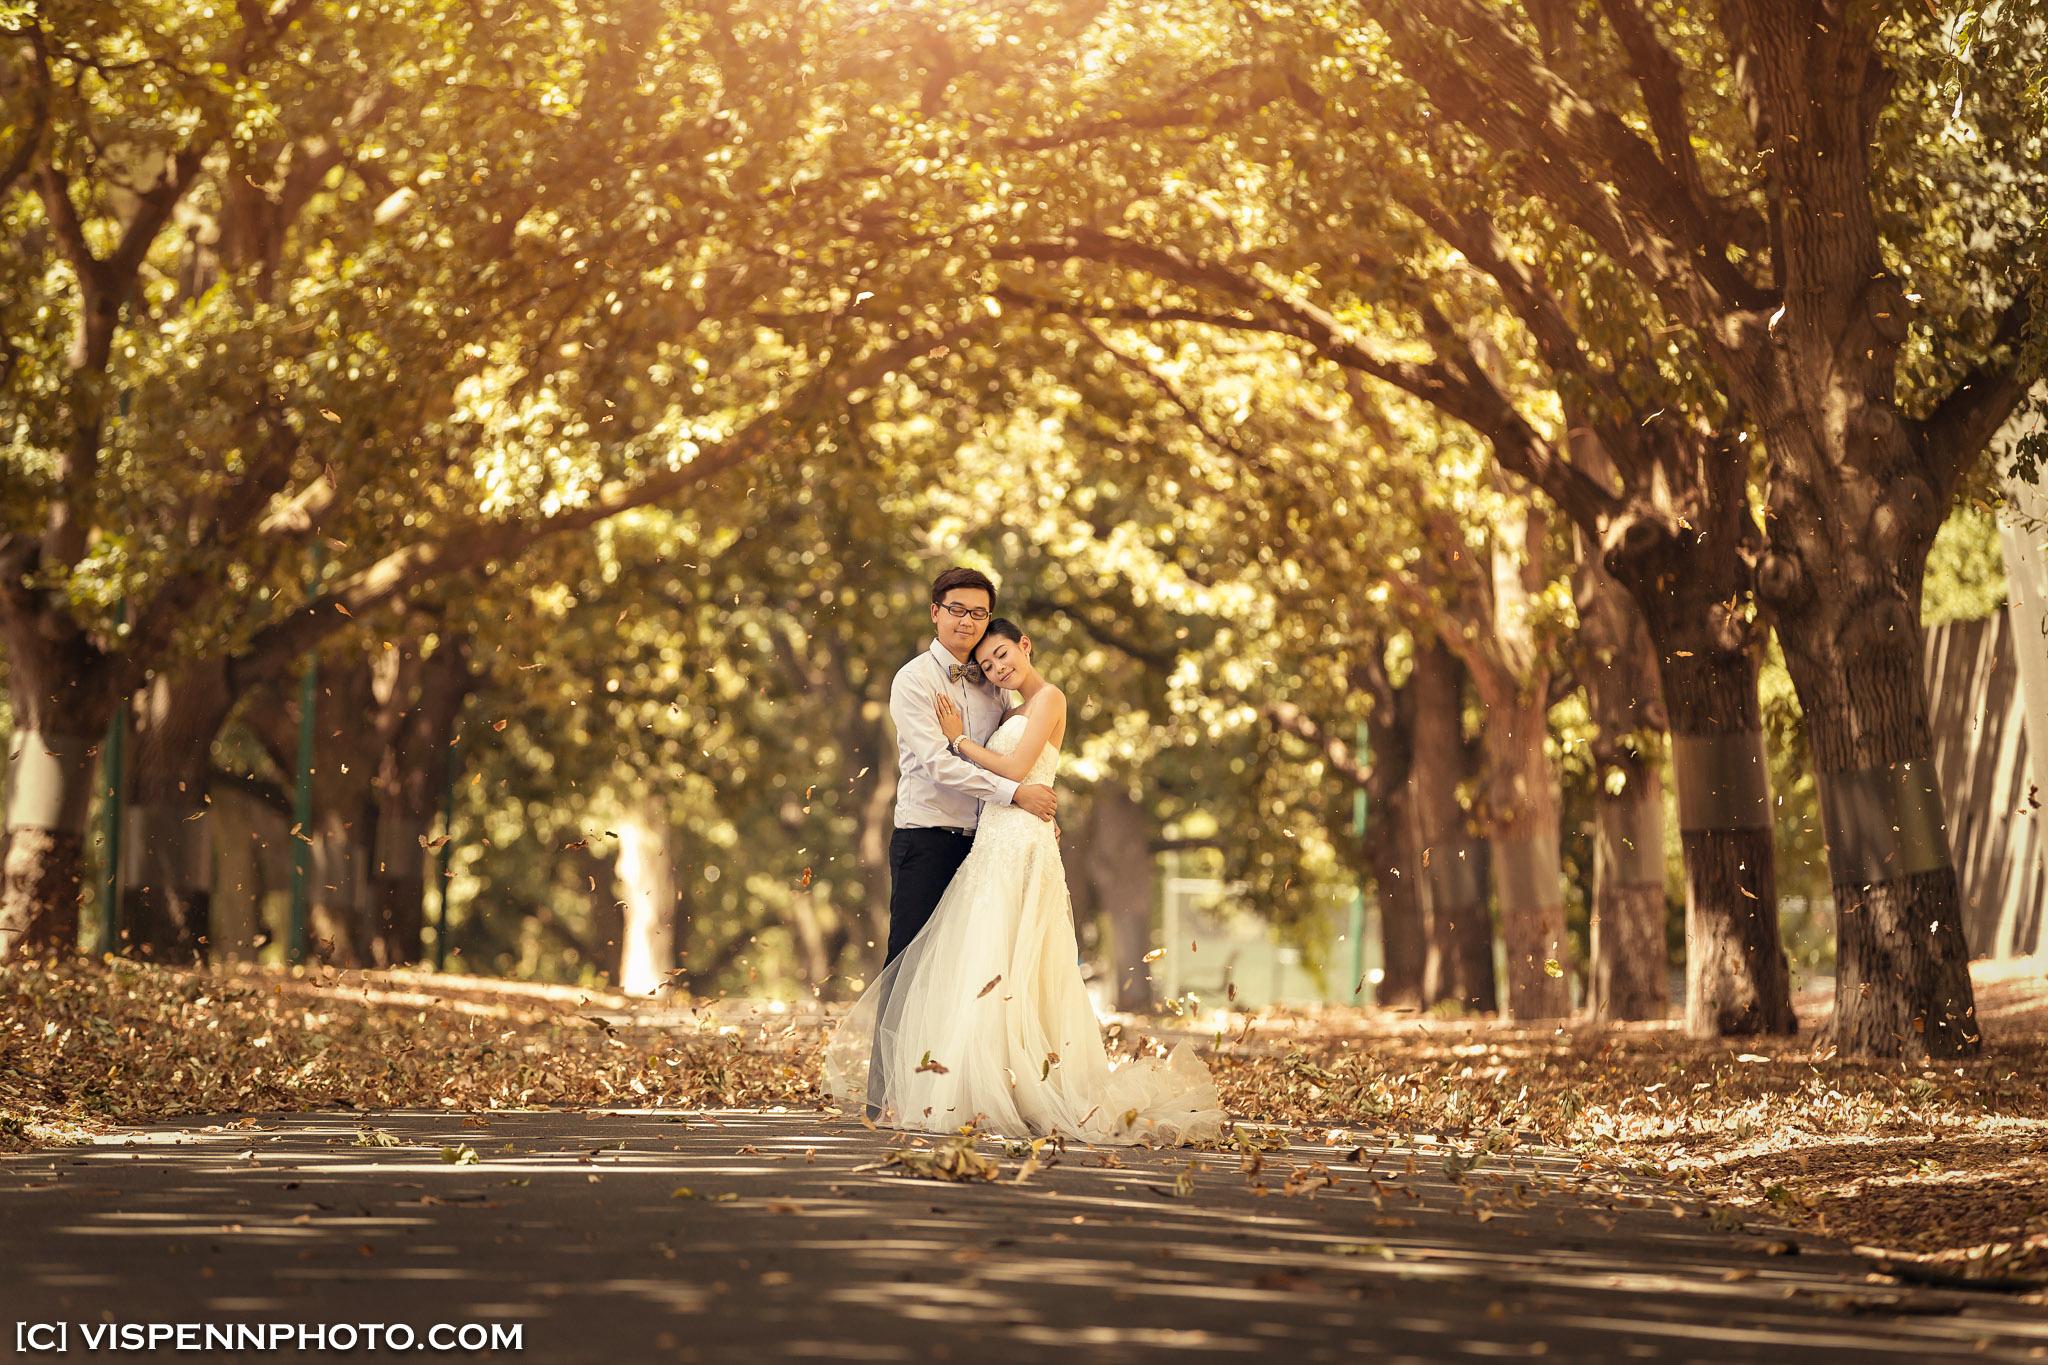 PRE WEDDING Photography Melbourne VISPENN 墨尔本 婚纱照 结婚照 婚纱摄影 KarenCai 2560 1